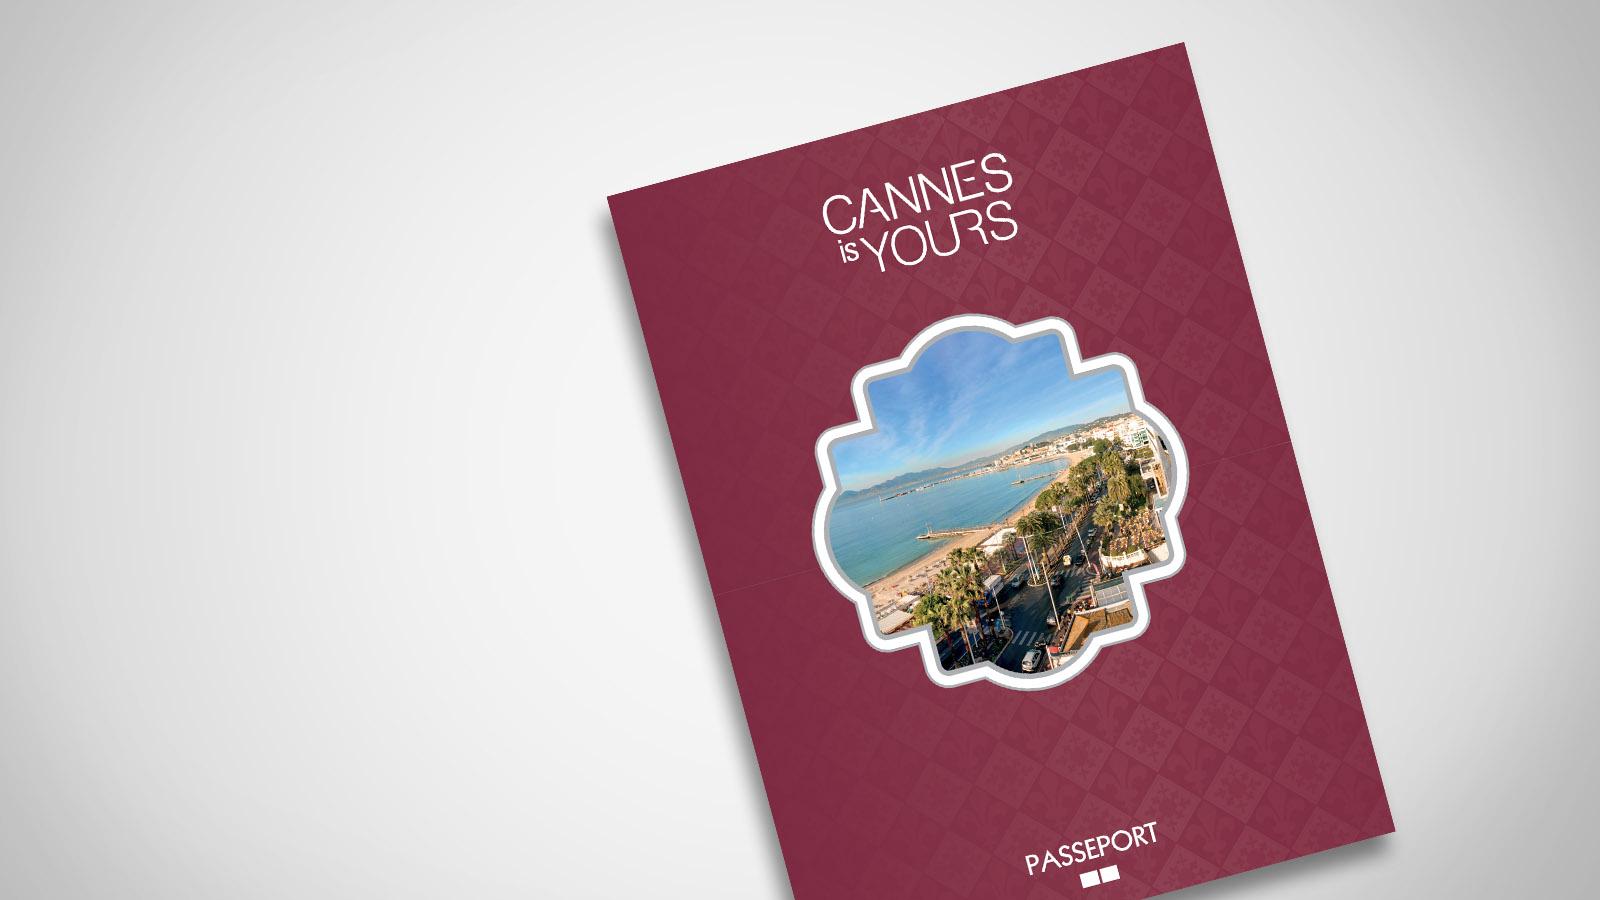 passeport_cannes_01